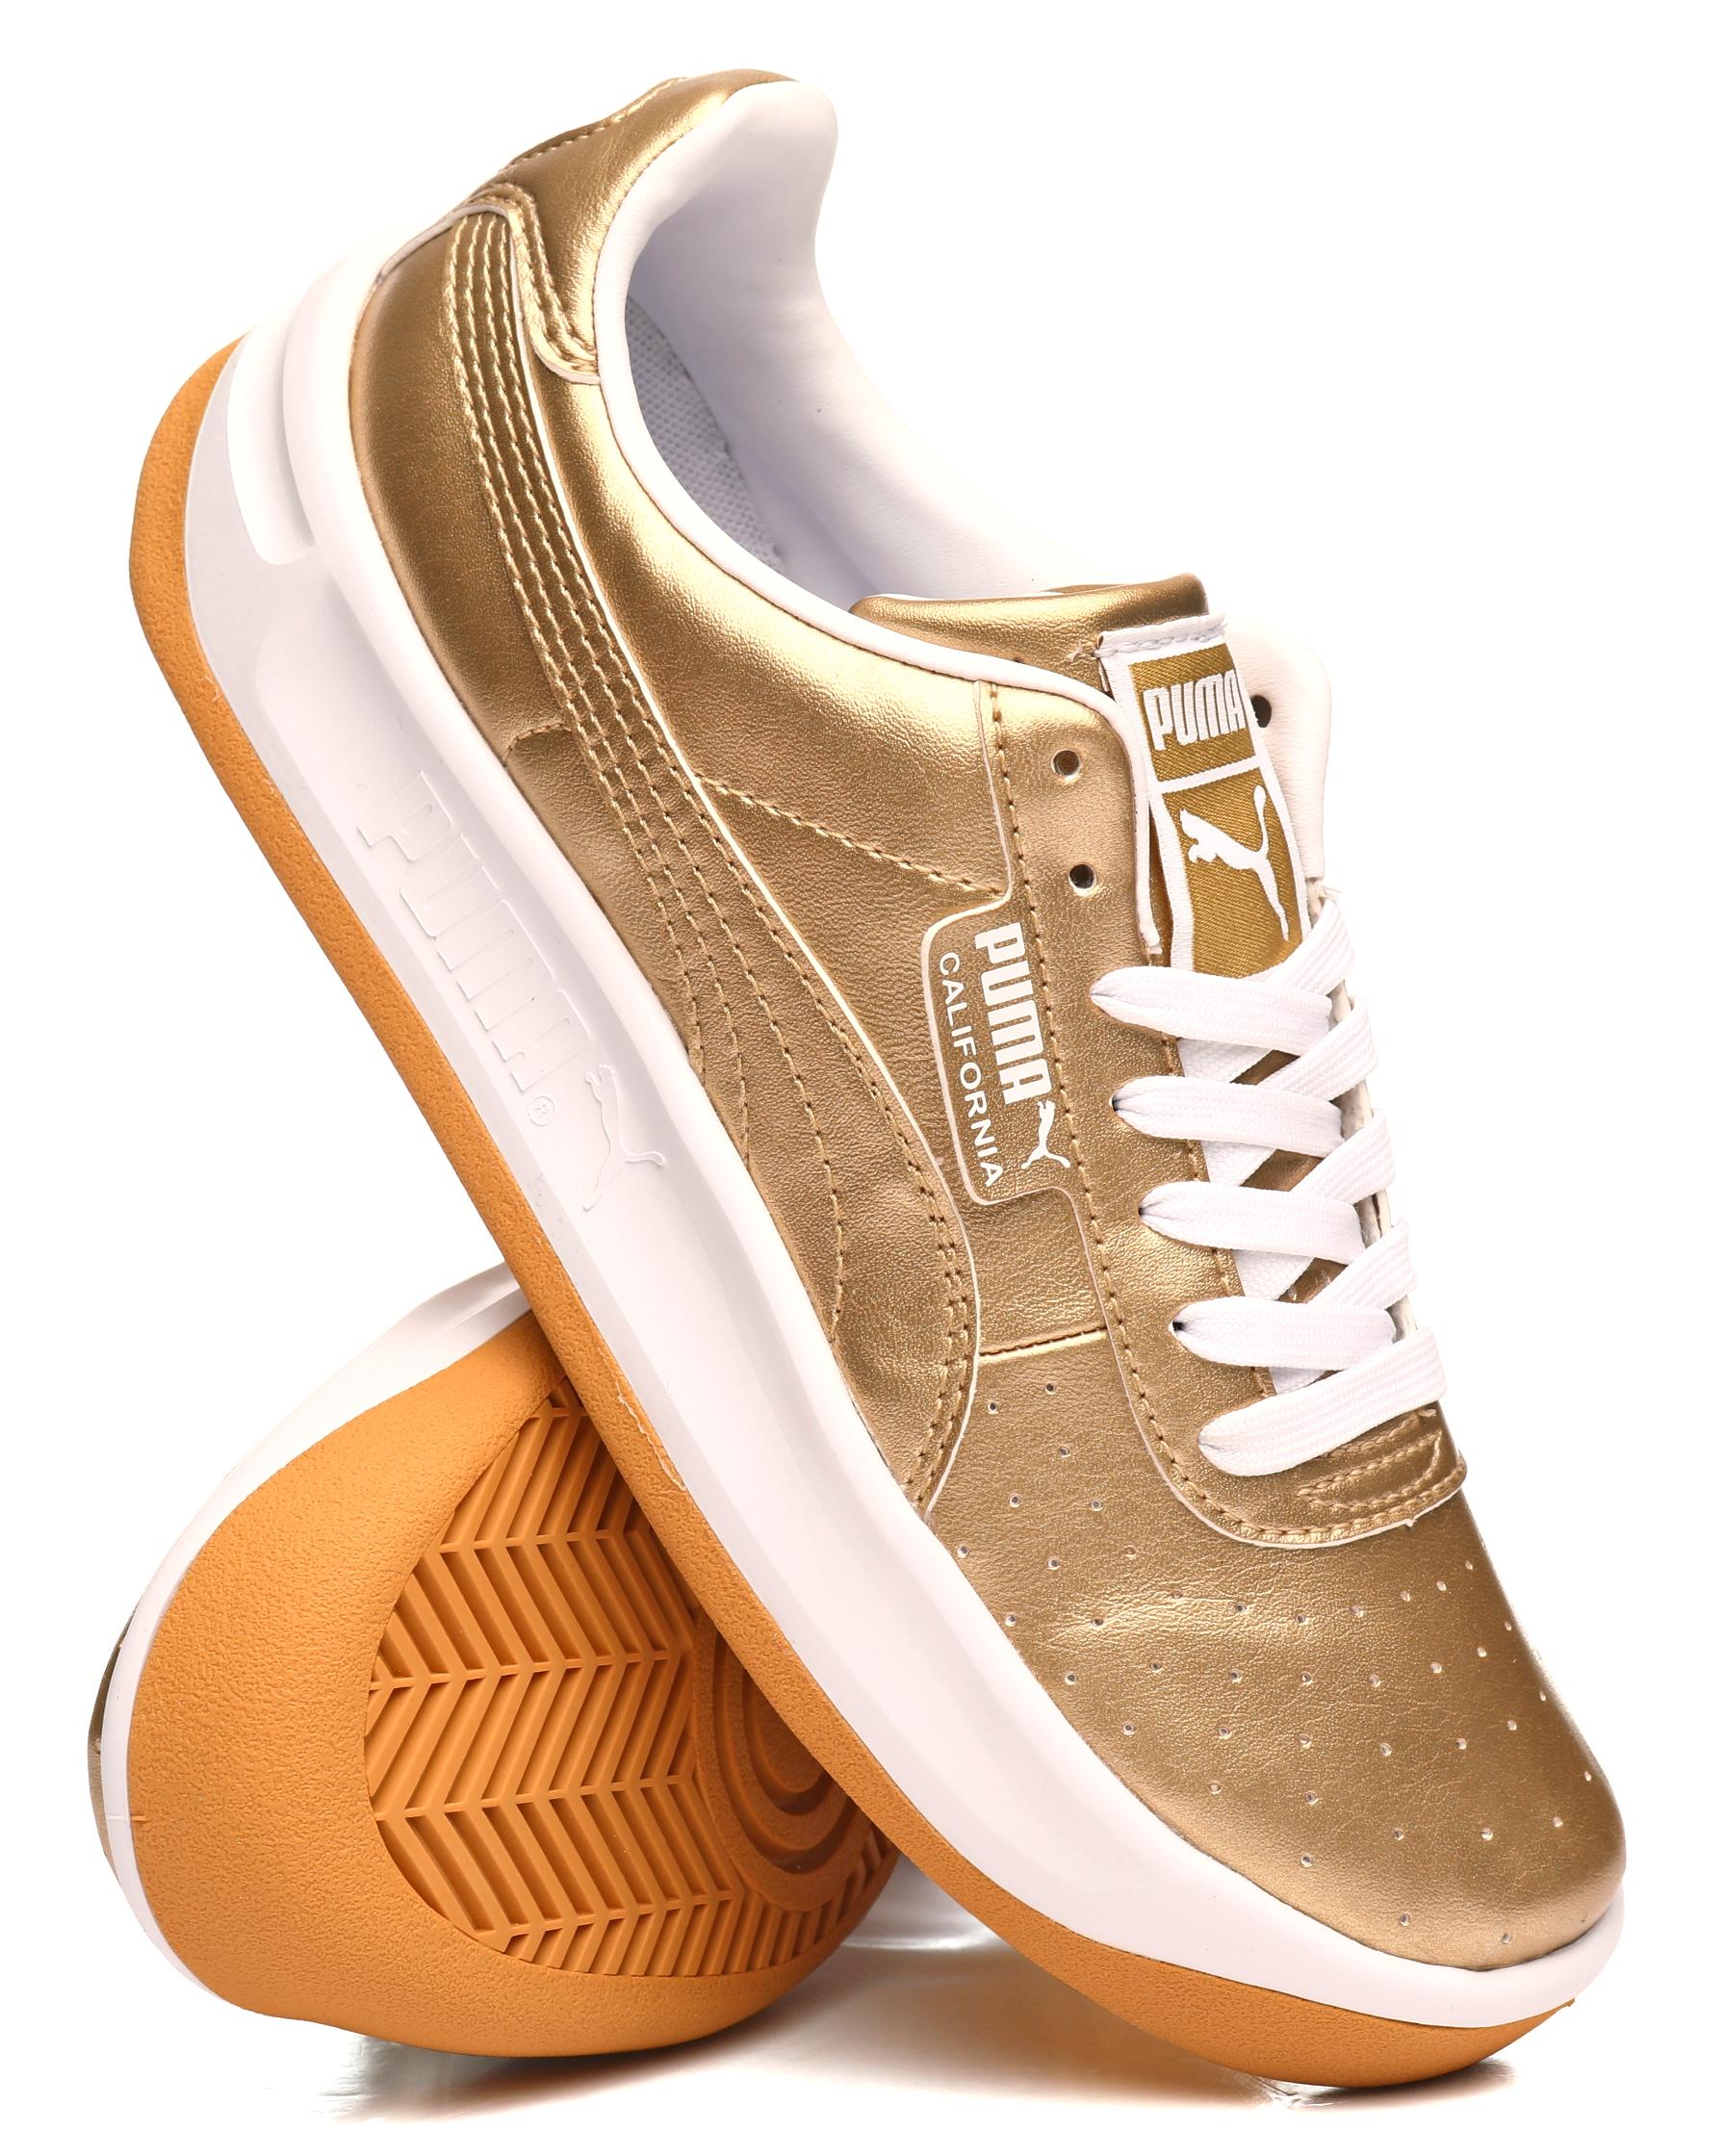 30503c5922 Buy California Metallic Jr Sneakers (4-7) Boys Footwear from Puma ...